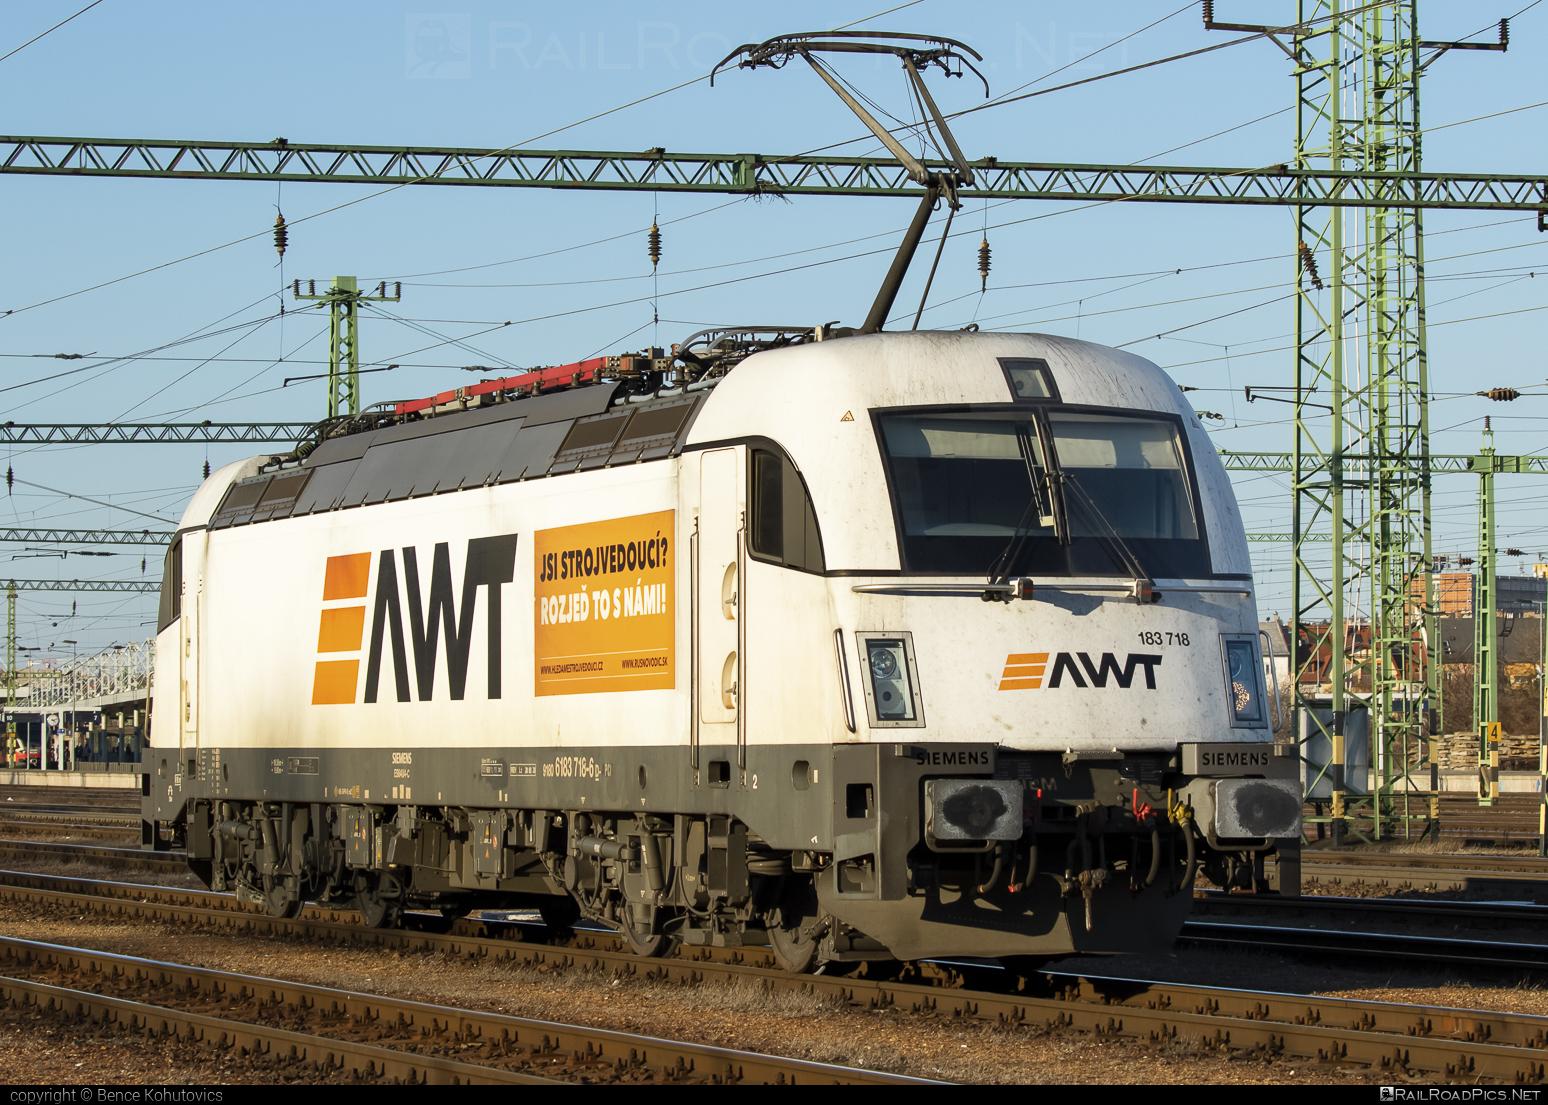 Siemens ES 64 U4 - 183 718 operated by PKP CARGO INTERNATIONAL a.s. #awt #es64 #es64u #es64u4 #eurosprinter #pkpcargointernational #pkpcargointernationalas #siemens #siemenses64 #siemenses64u #siemenses64u4 #siemenstaurus #taurus #tauruslocomotive